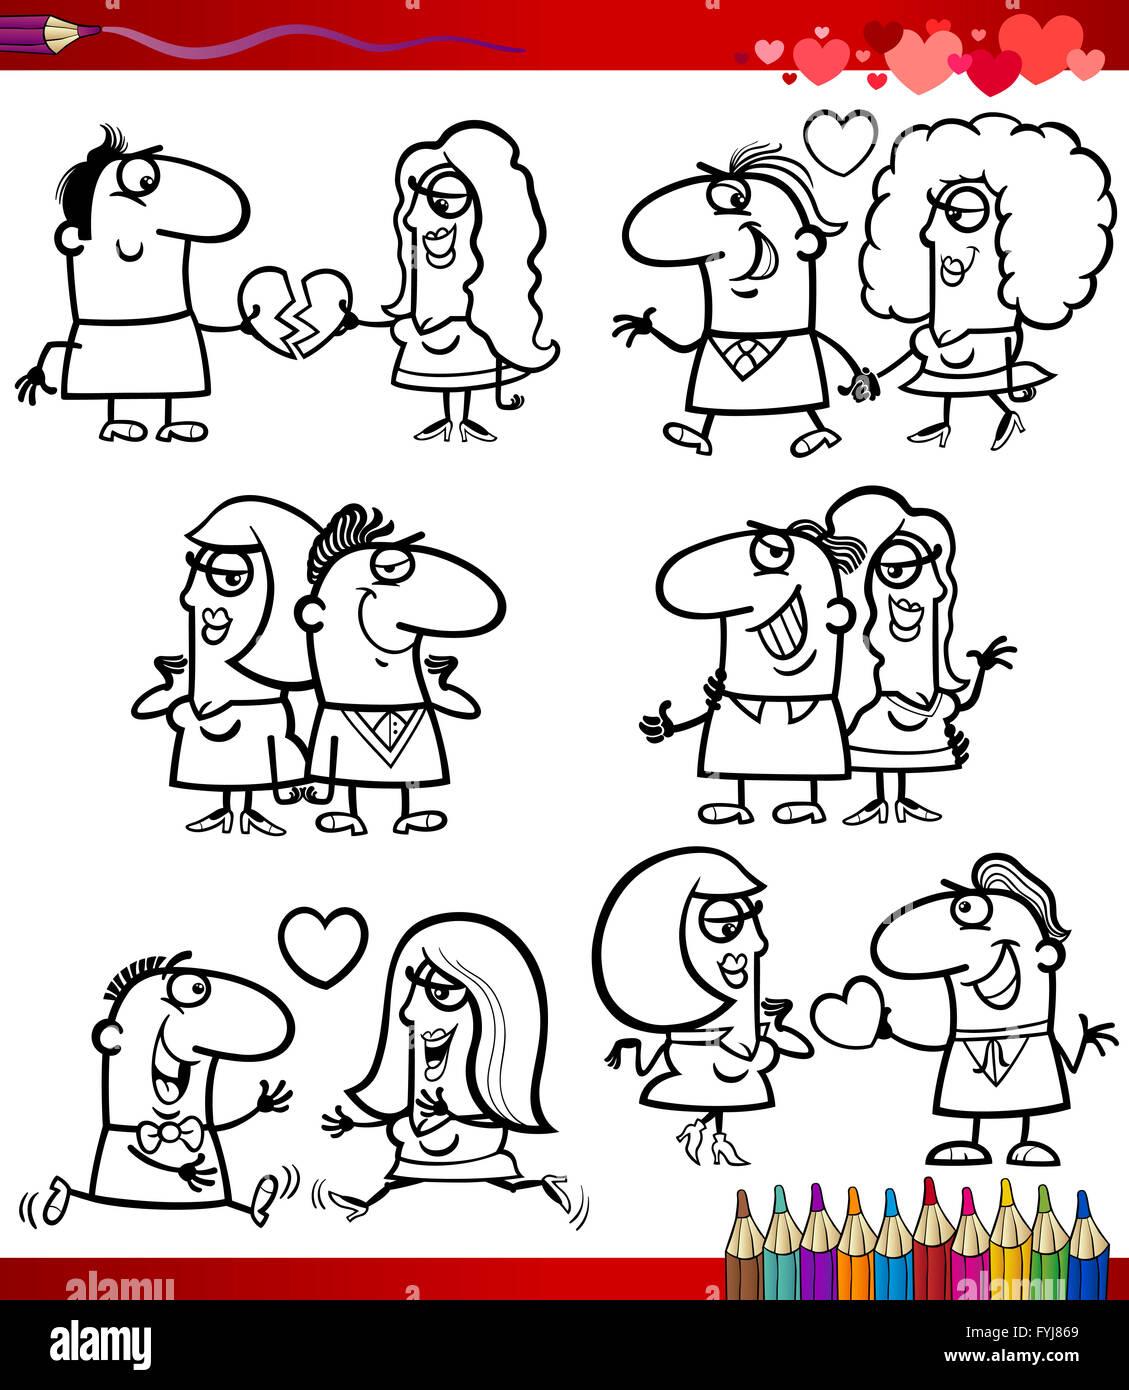 paar in Liebe Cartoons Malvorlagen Stockfotografie - Alamy